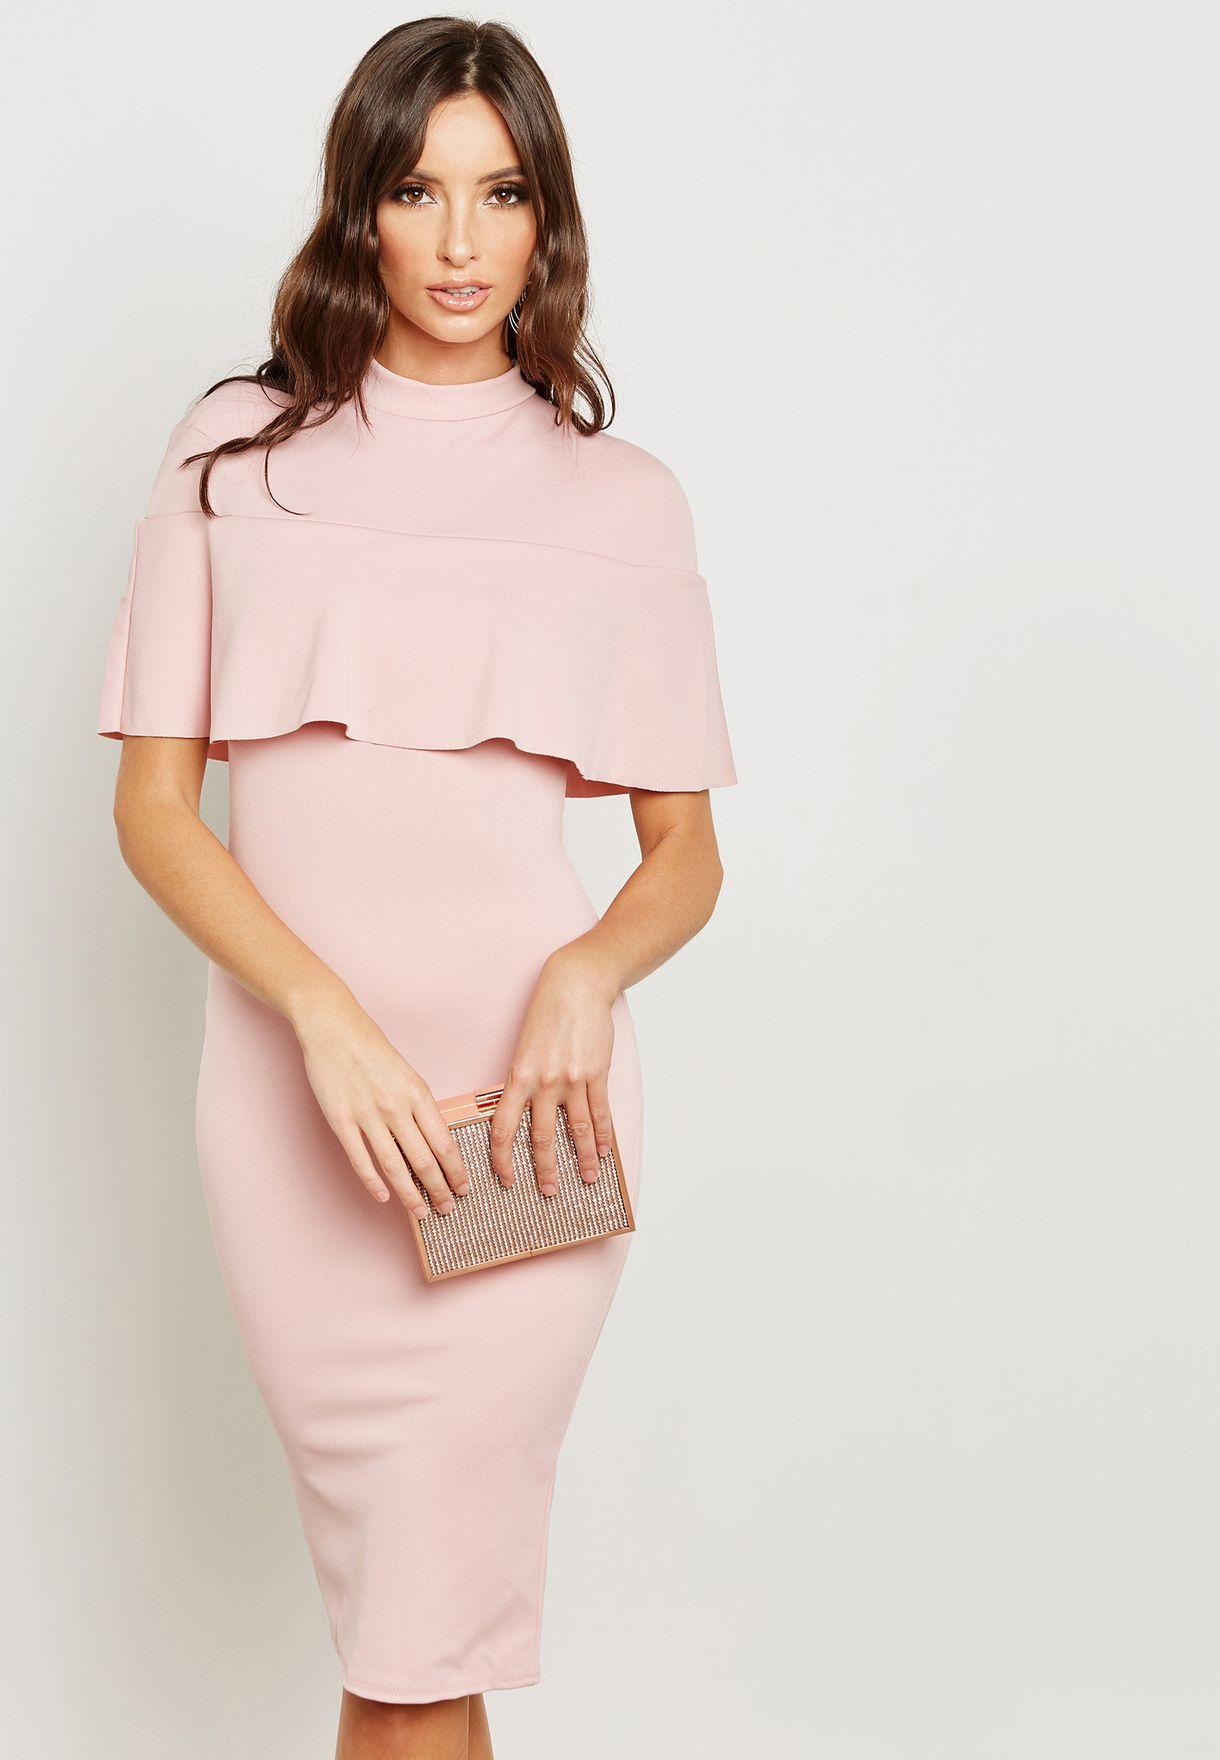 465496290f Shop Missguided pink Frill Overlay Shoulder Midi Dress DE922294 for ...